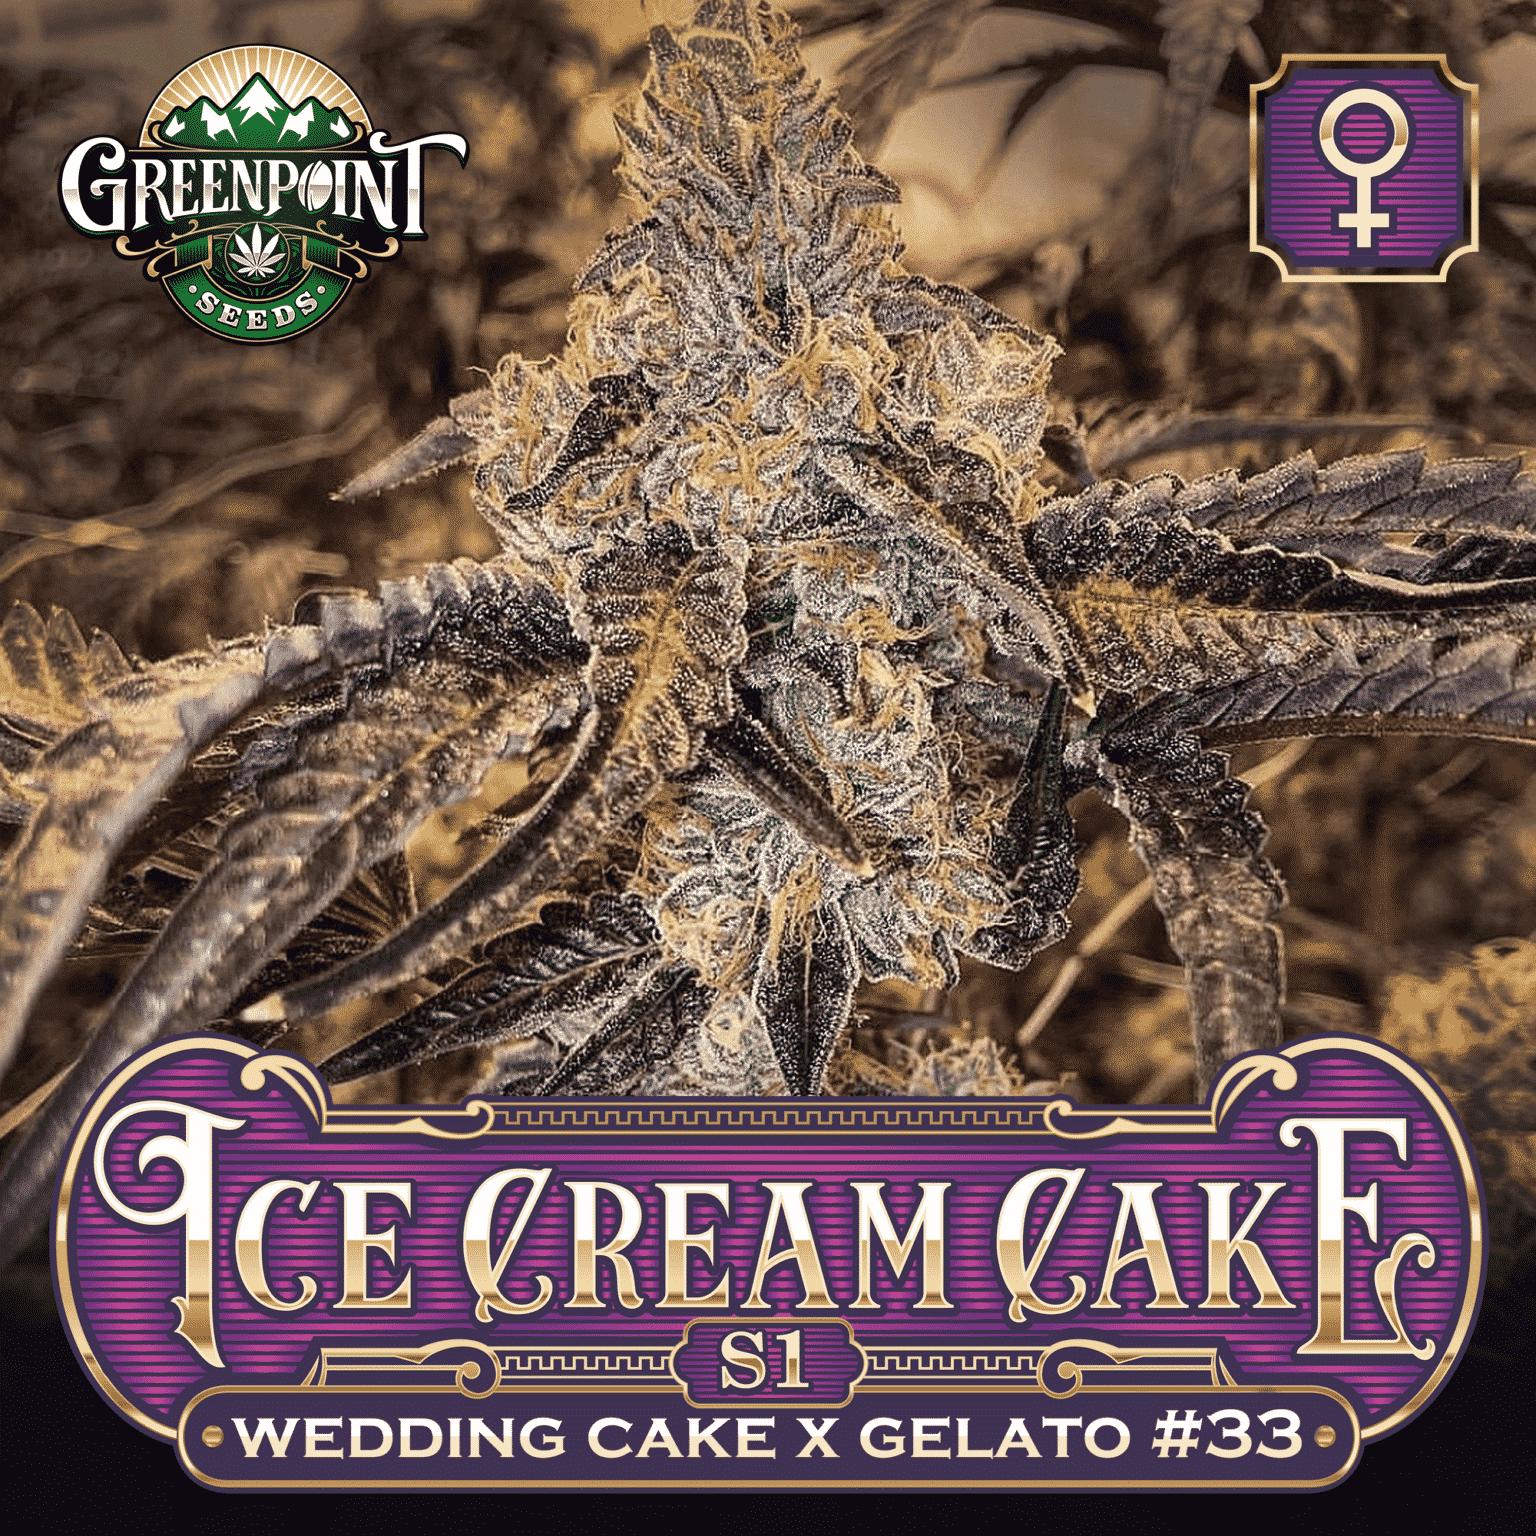 Ice Cream Cake S1 Feminized Cannabis Seeds - Greenpoint Seeds